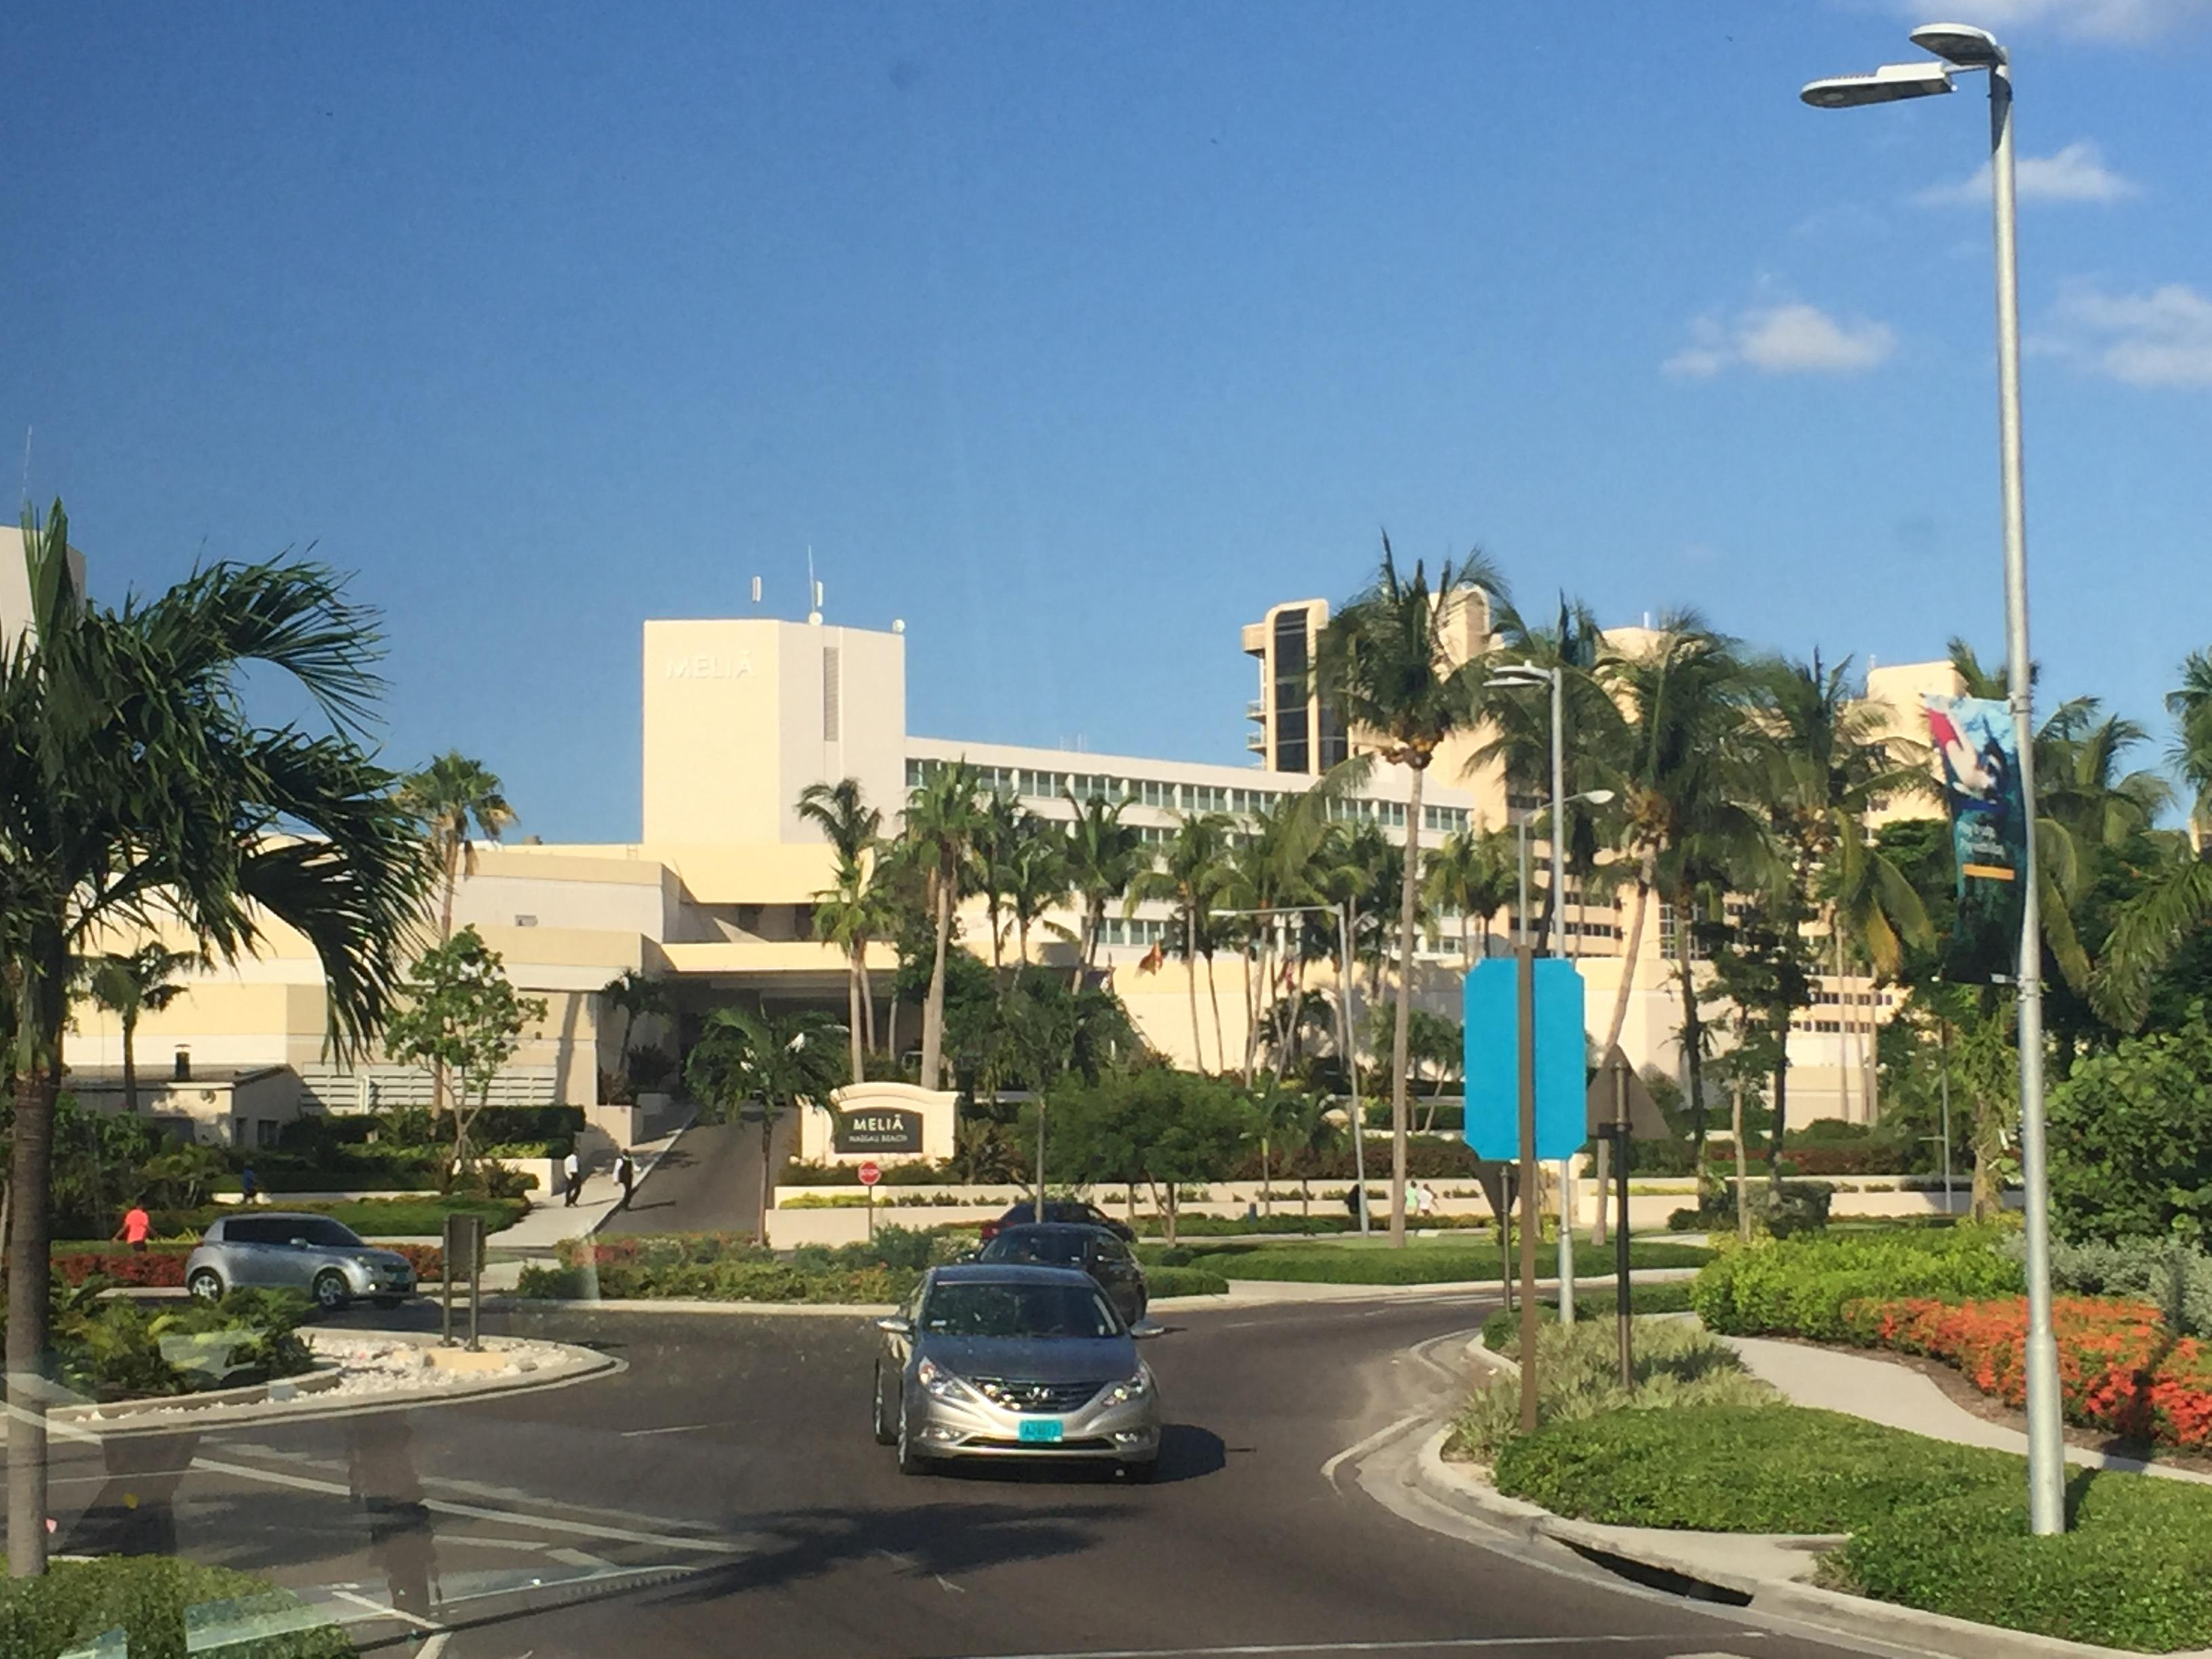 The Melia Hotel